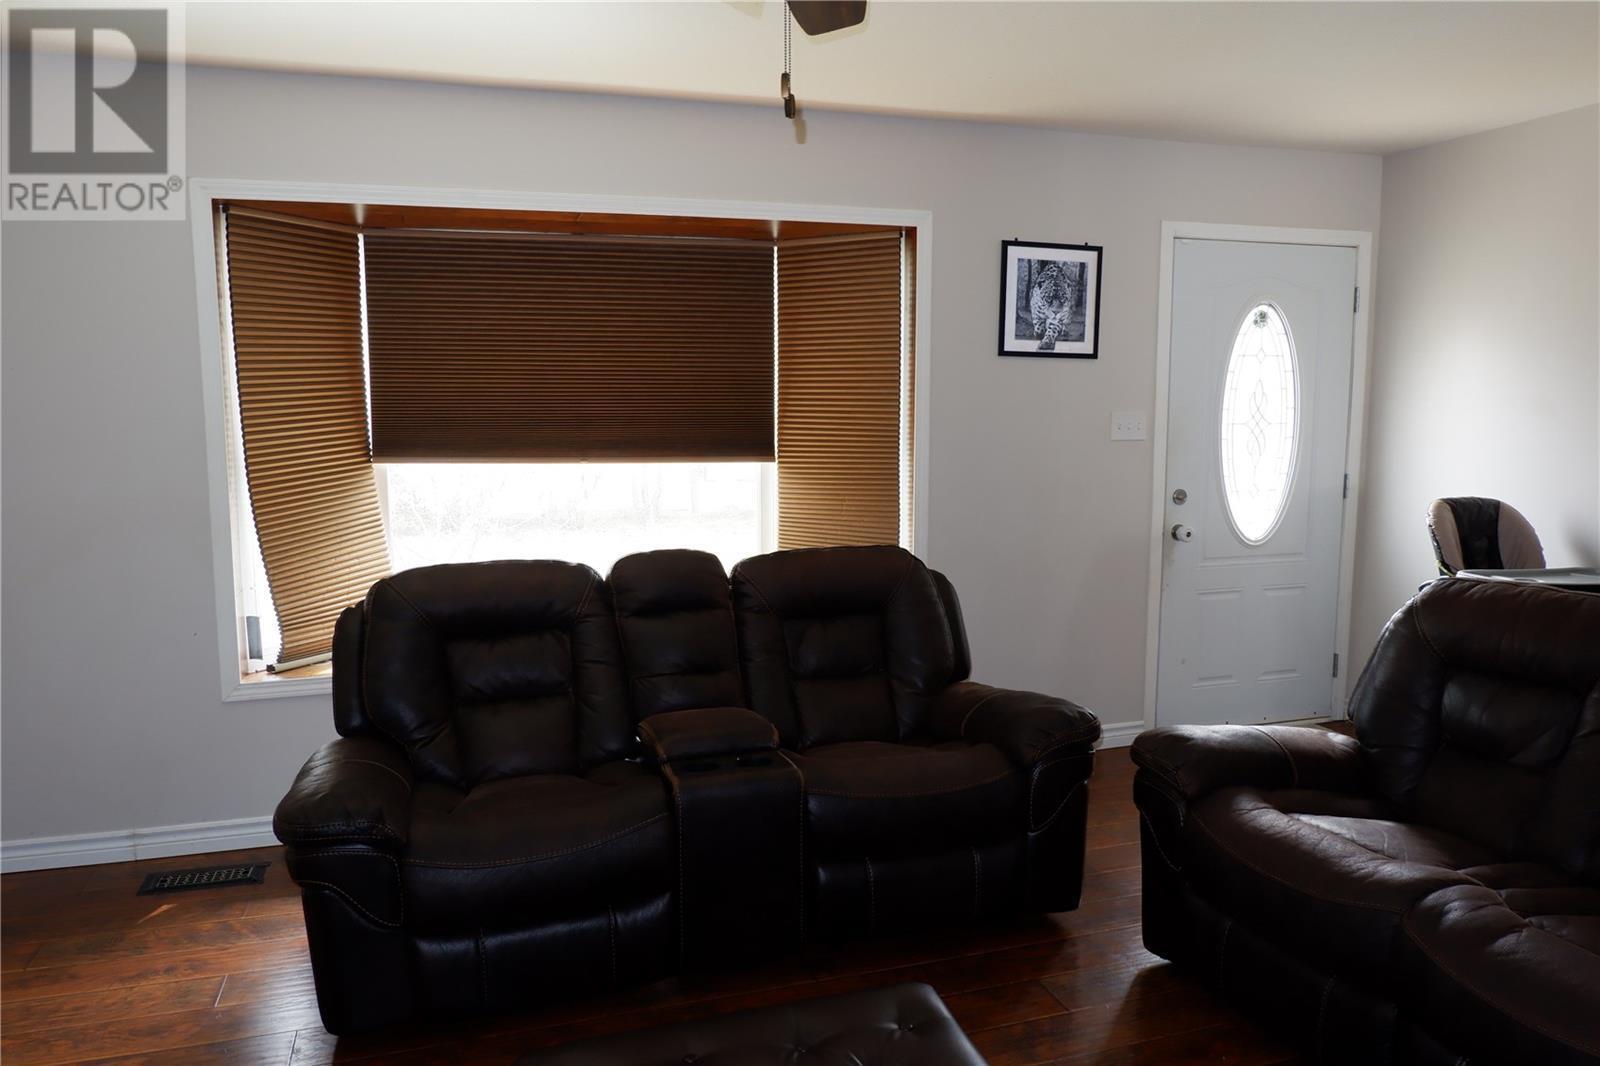 224 Crawford Ave W, Coronach, Saskatchewan  S0H 0Z0 - Photo 6 - SK805942